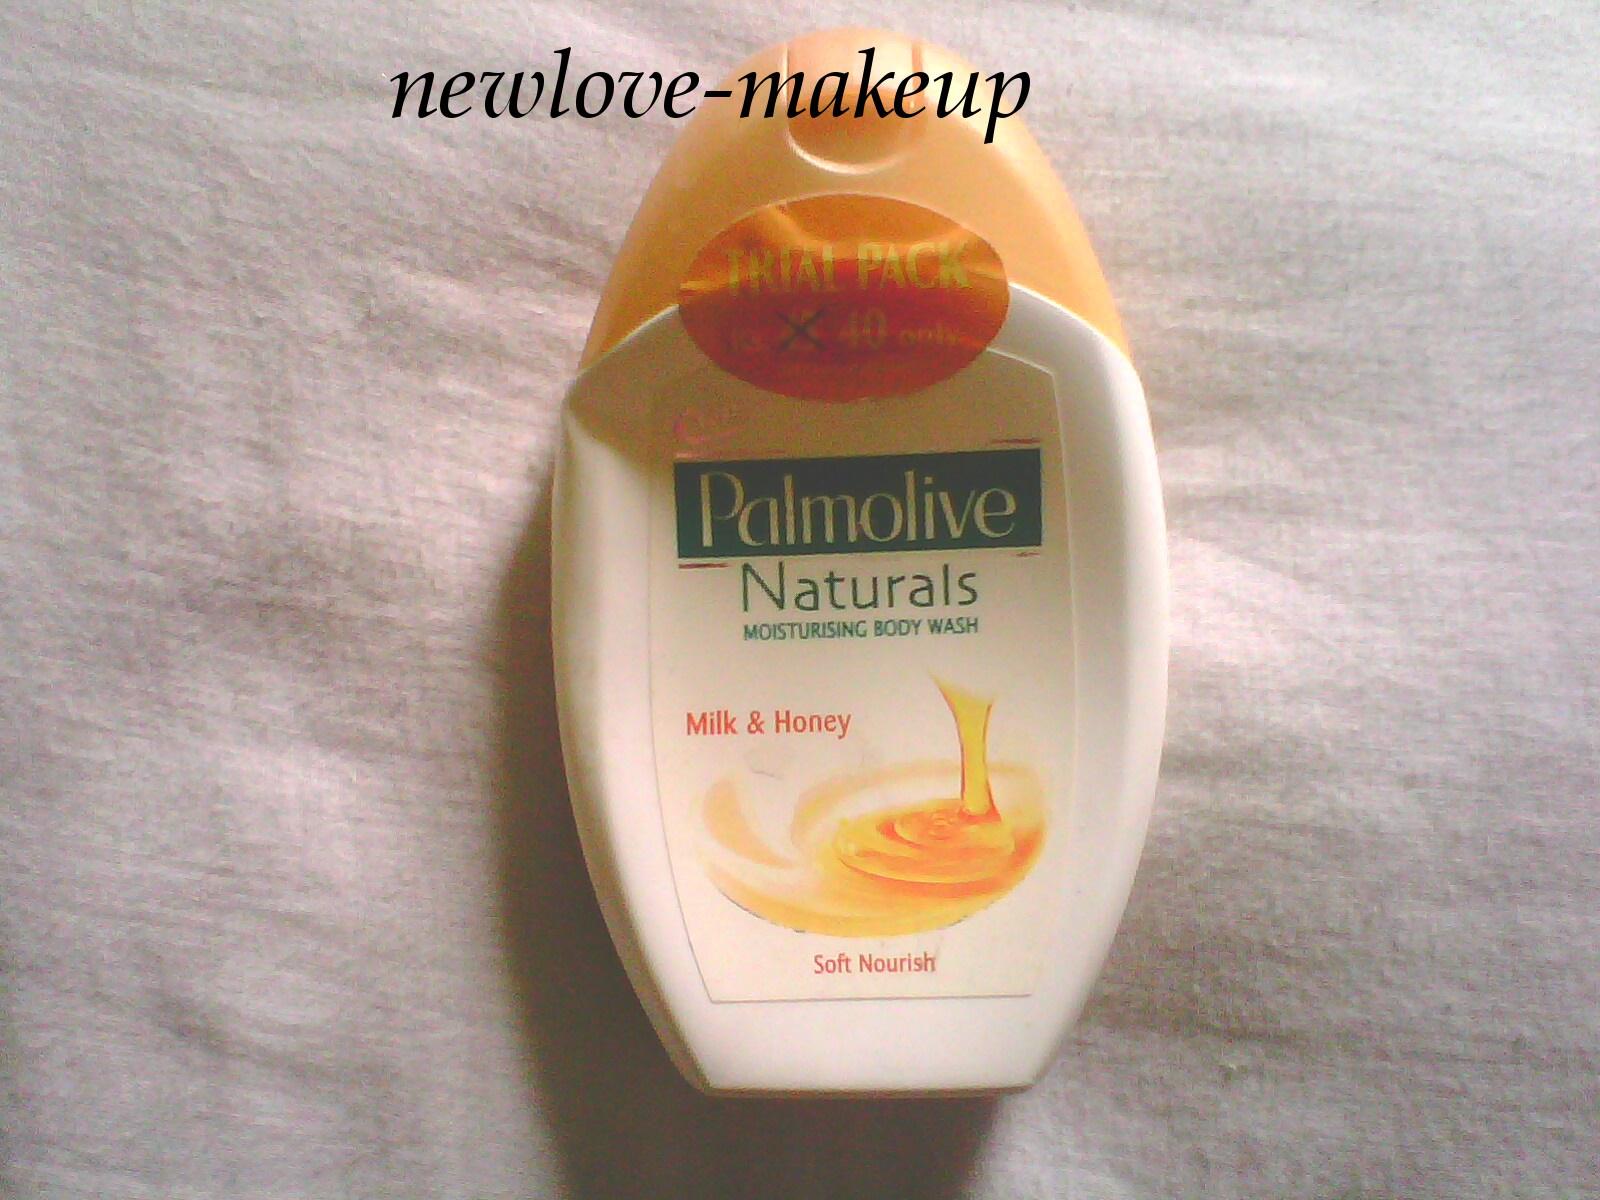 Palmolive Shower Gel Milkhoney 1 Liter Update Daftar Harga Cherry Blossom 1l Twinpacks Free Towel Naturals Moisturising Body Wash Milk And Honey Review